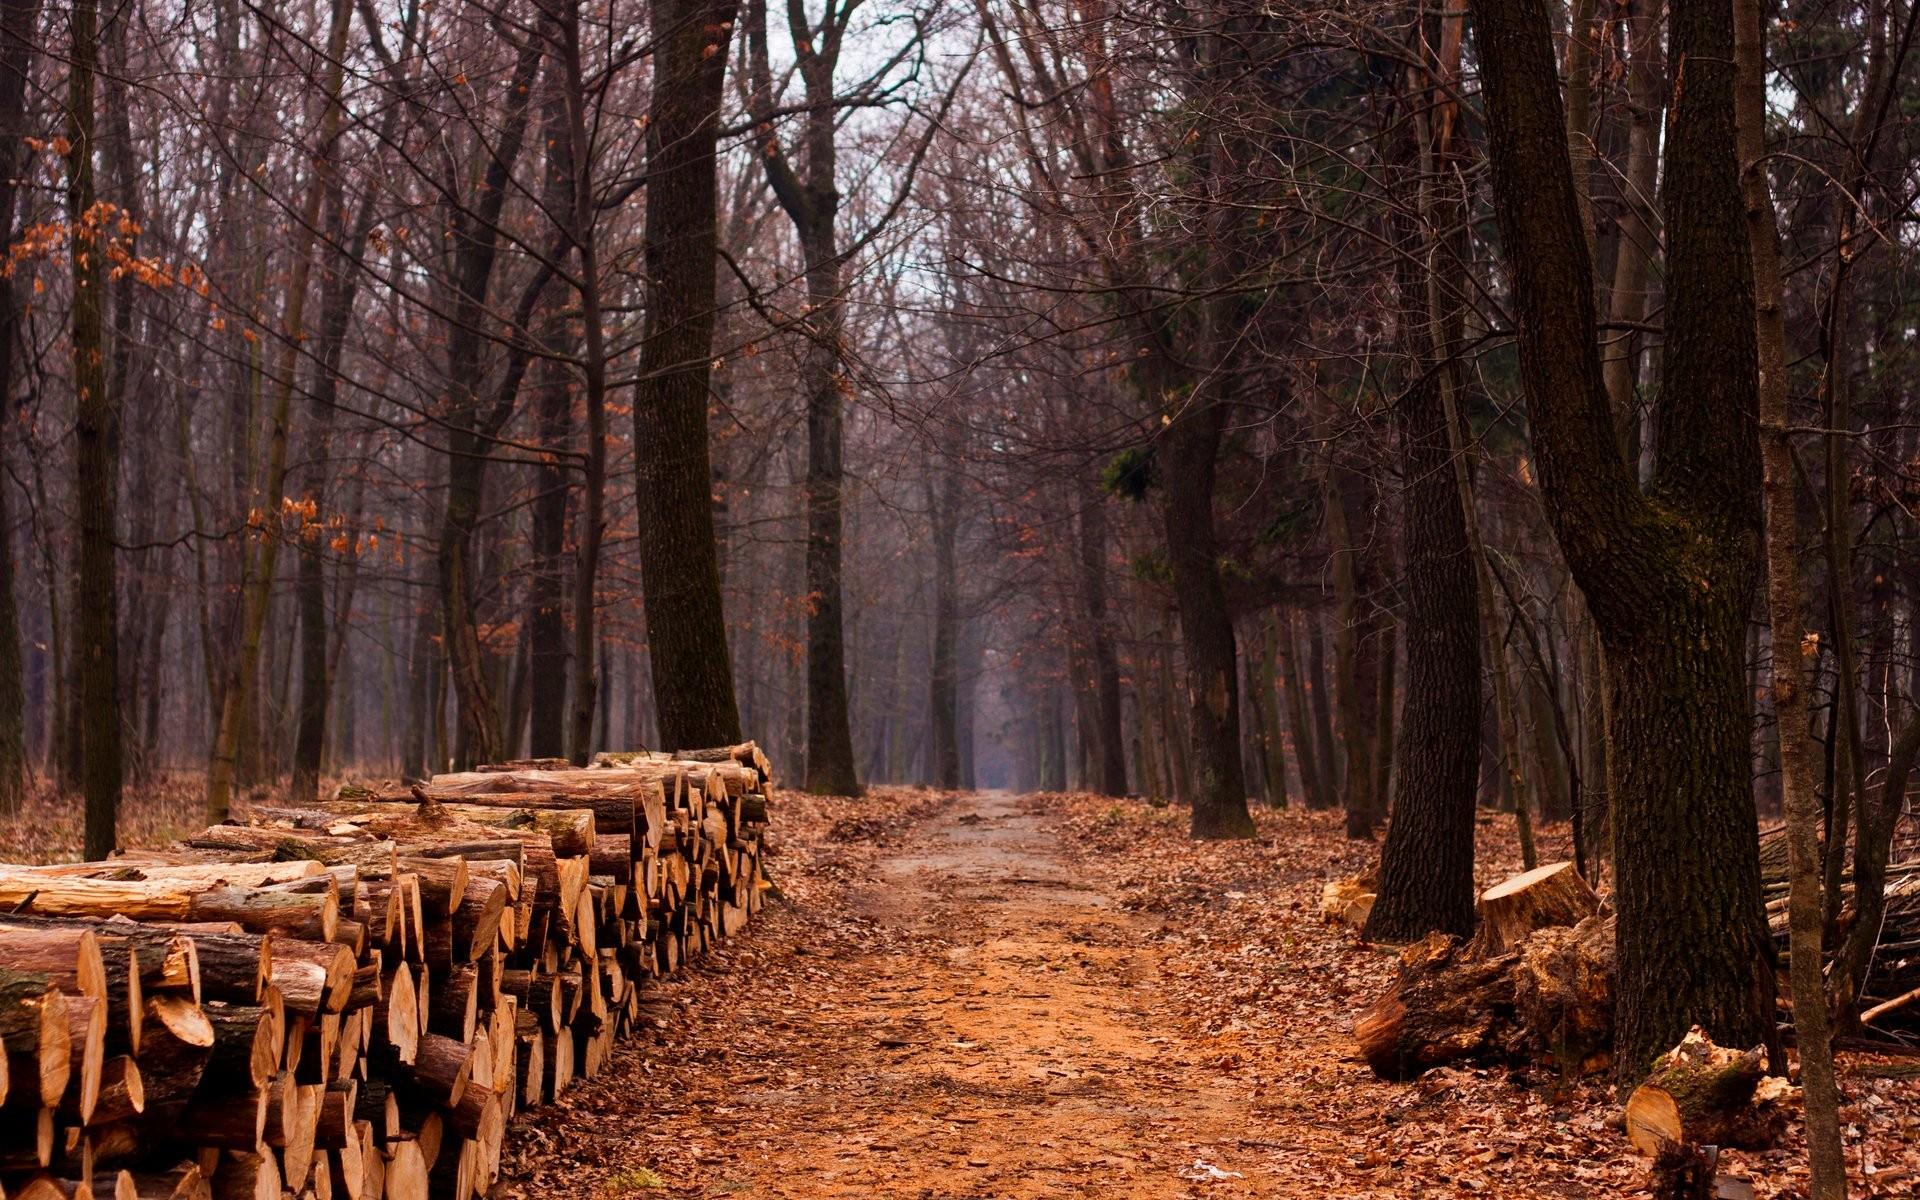 Forest Trees Peace Autumn Wallpaper Hd Landscape